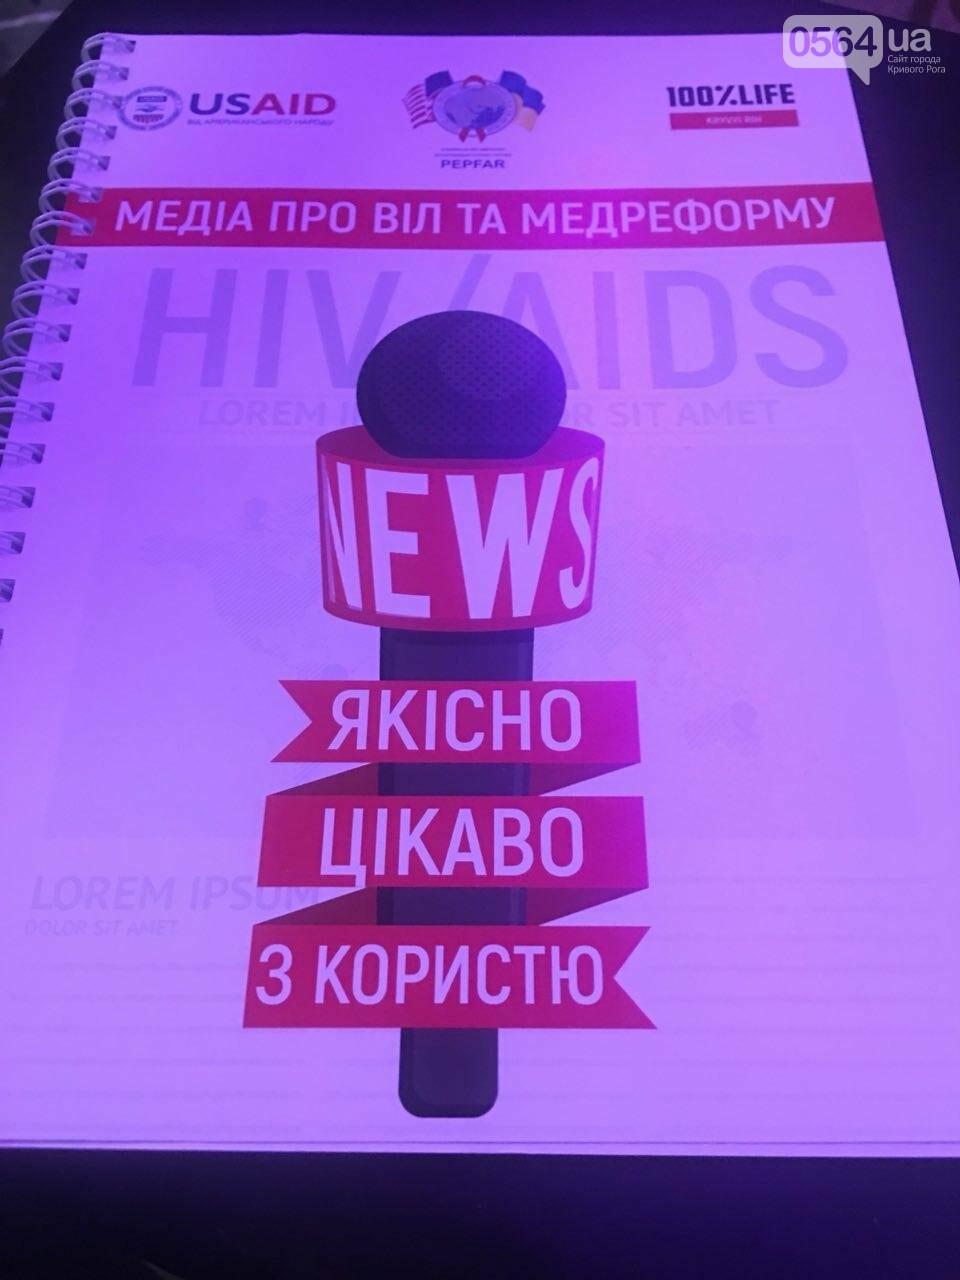 На тренинге о ВИЧ и медреформе криворожским журналистам рассказали о дискриминации и стереотипах, - ФОТО , фото-25